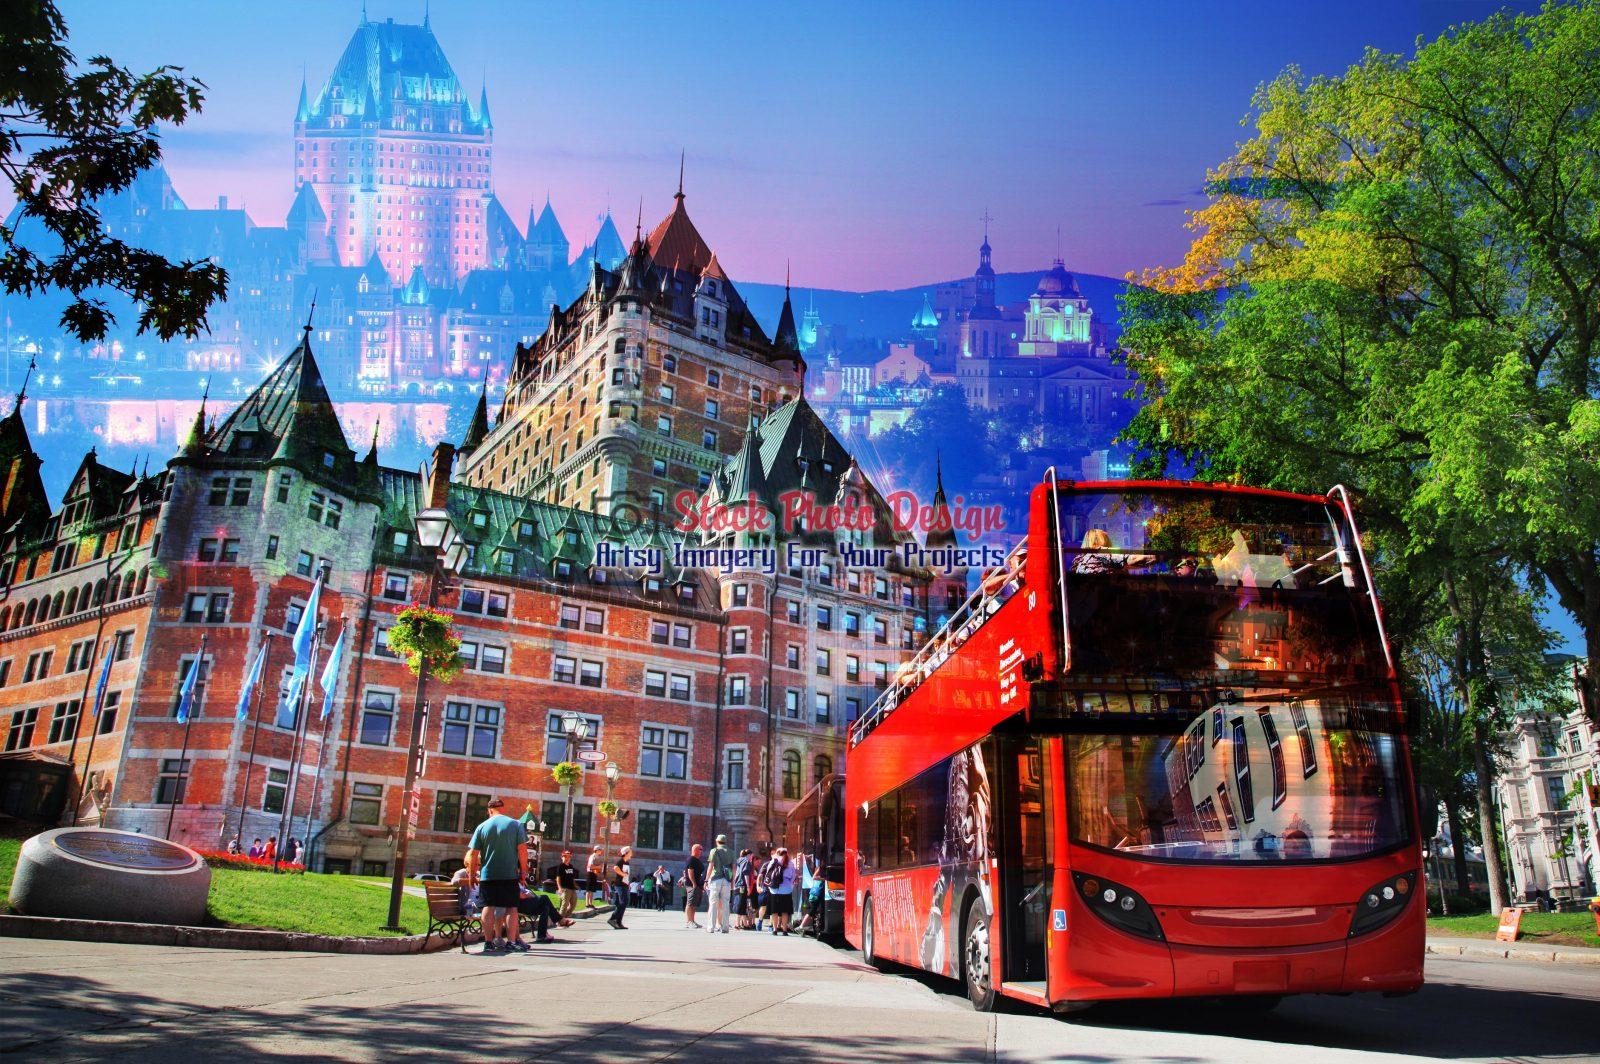 Quebec-City-Bus-Photo-Montage-Images